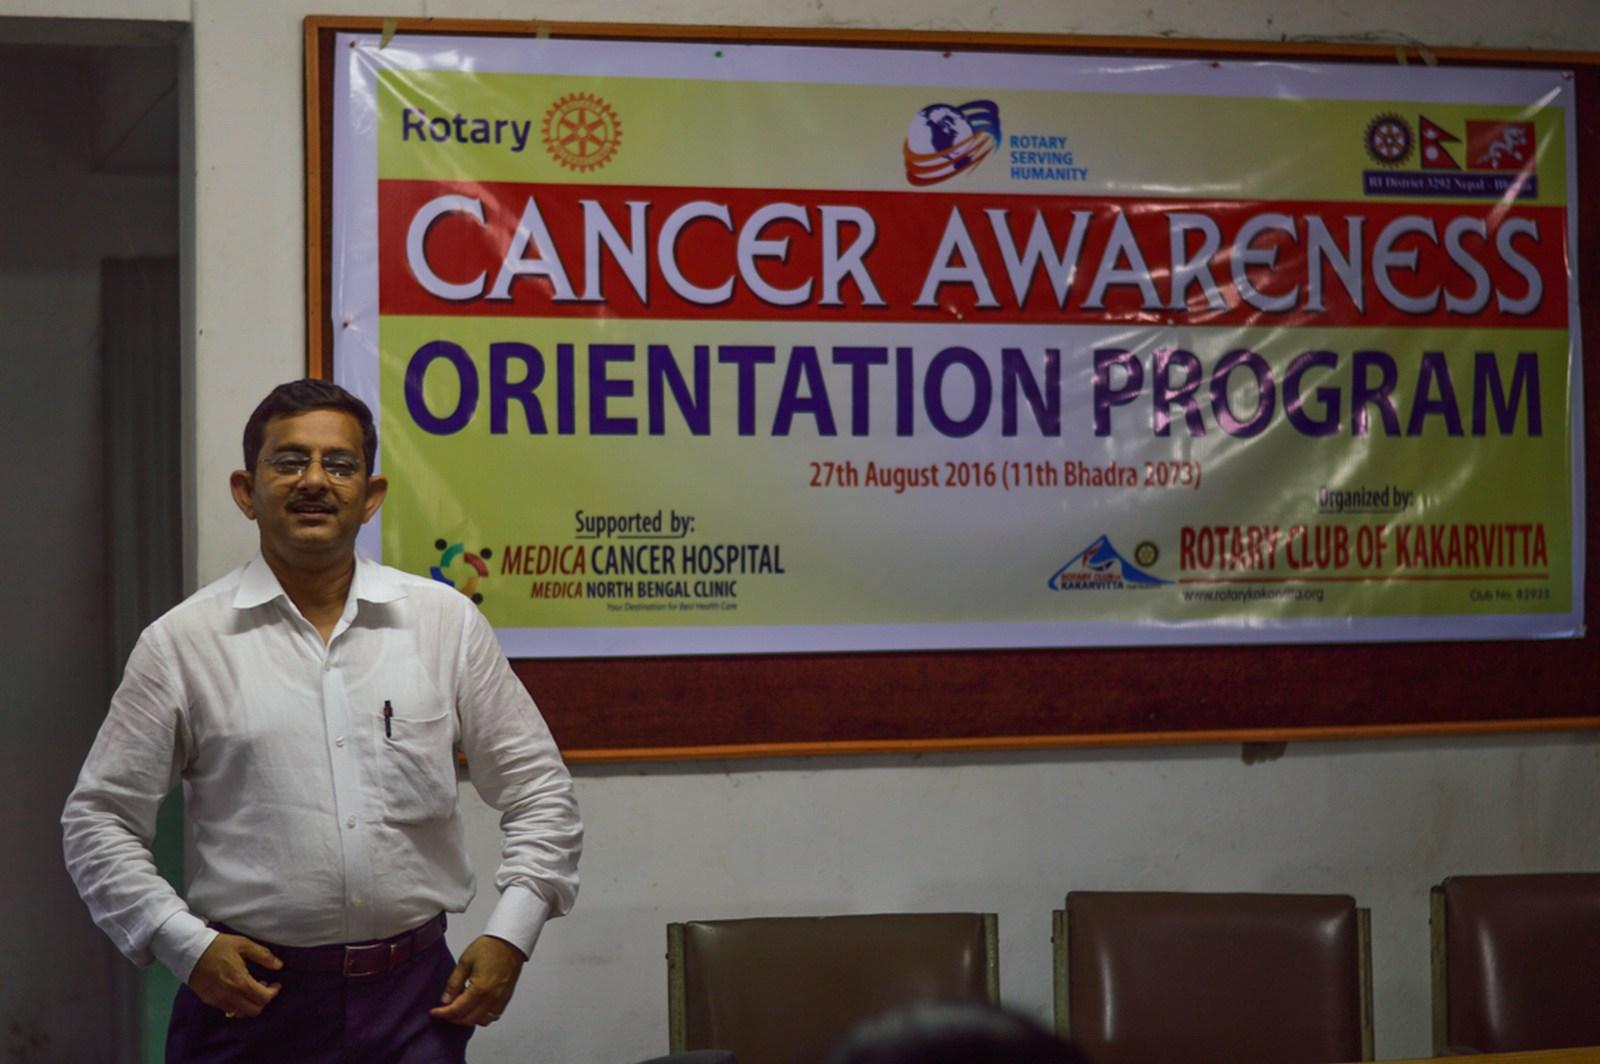 Cancer-Awareness-Orientation-Program-2016-Rotary-Club-of-Kakarvitta-19